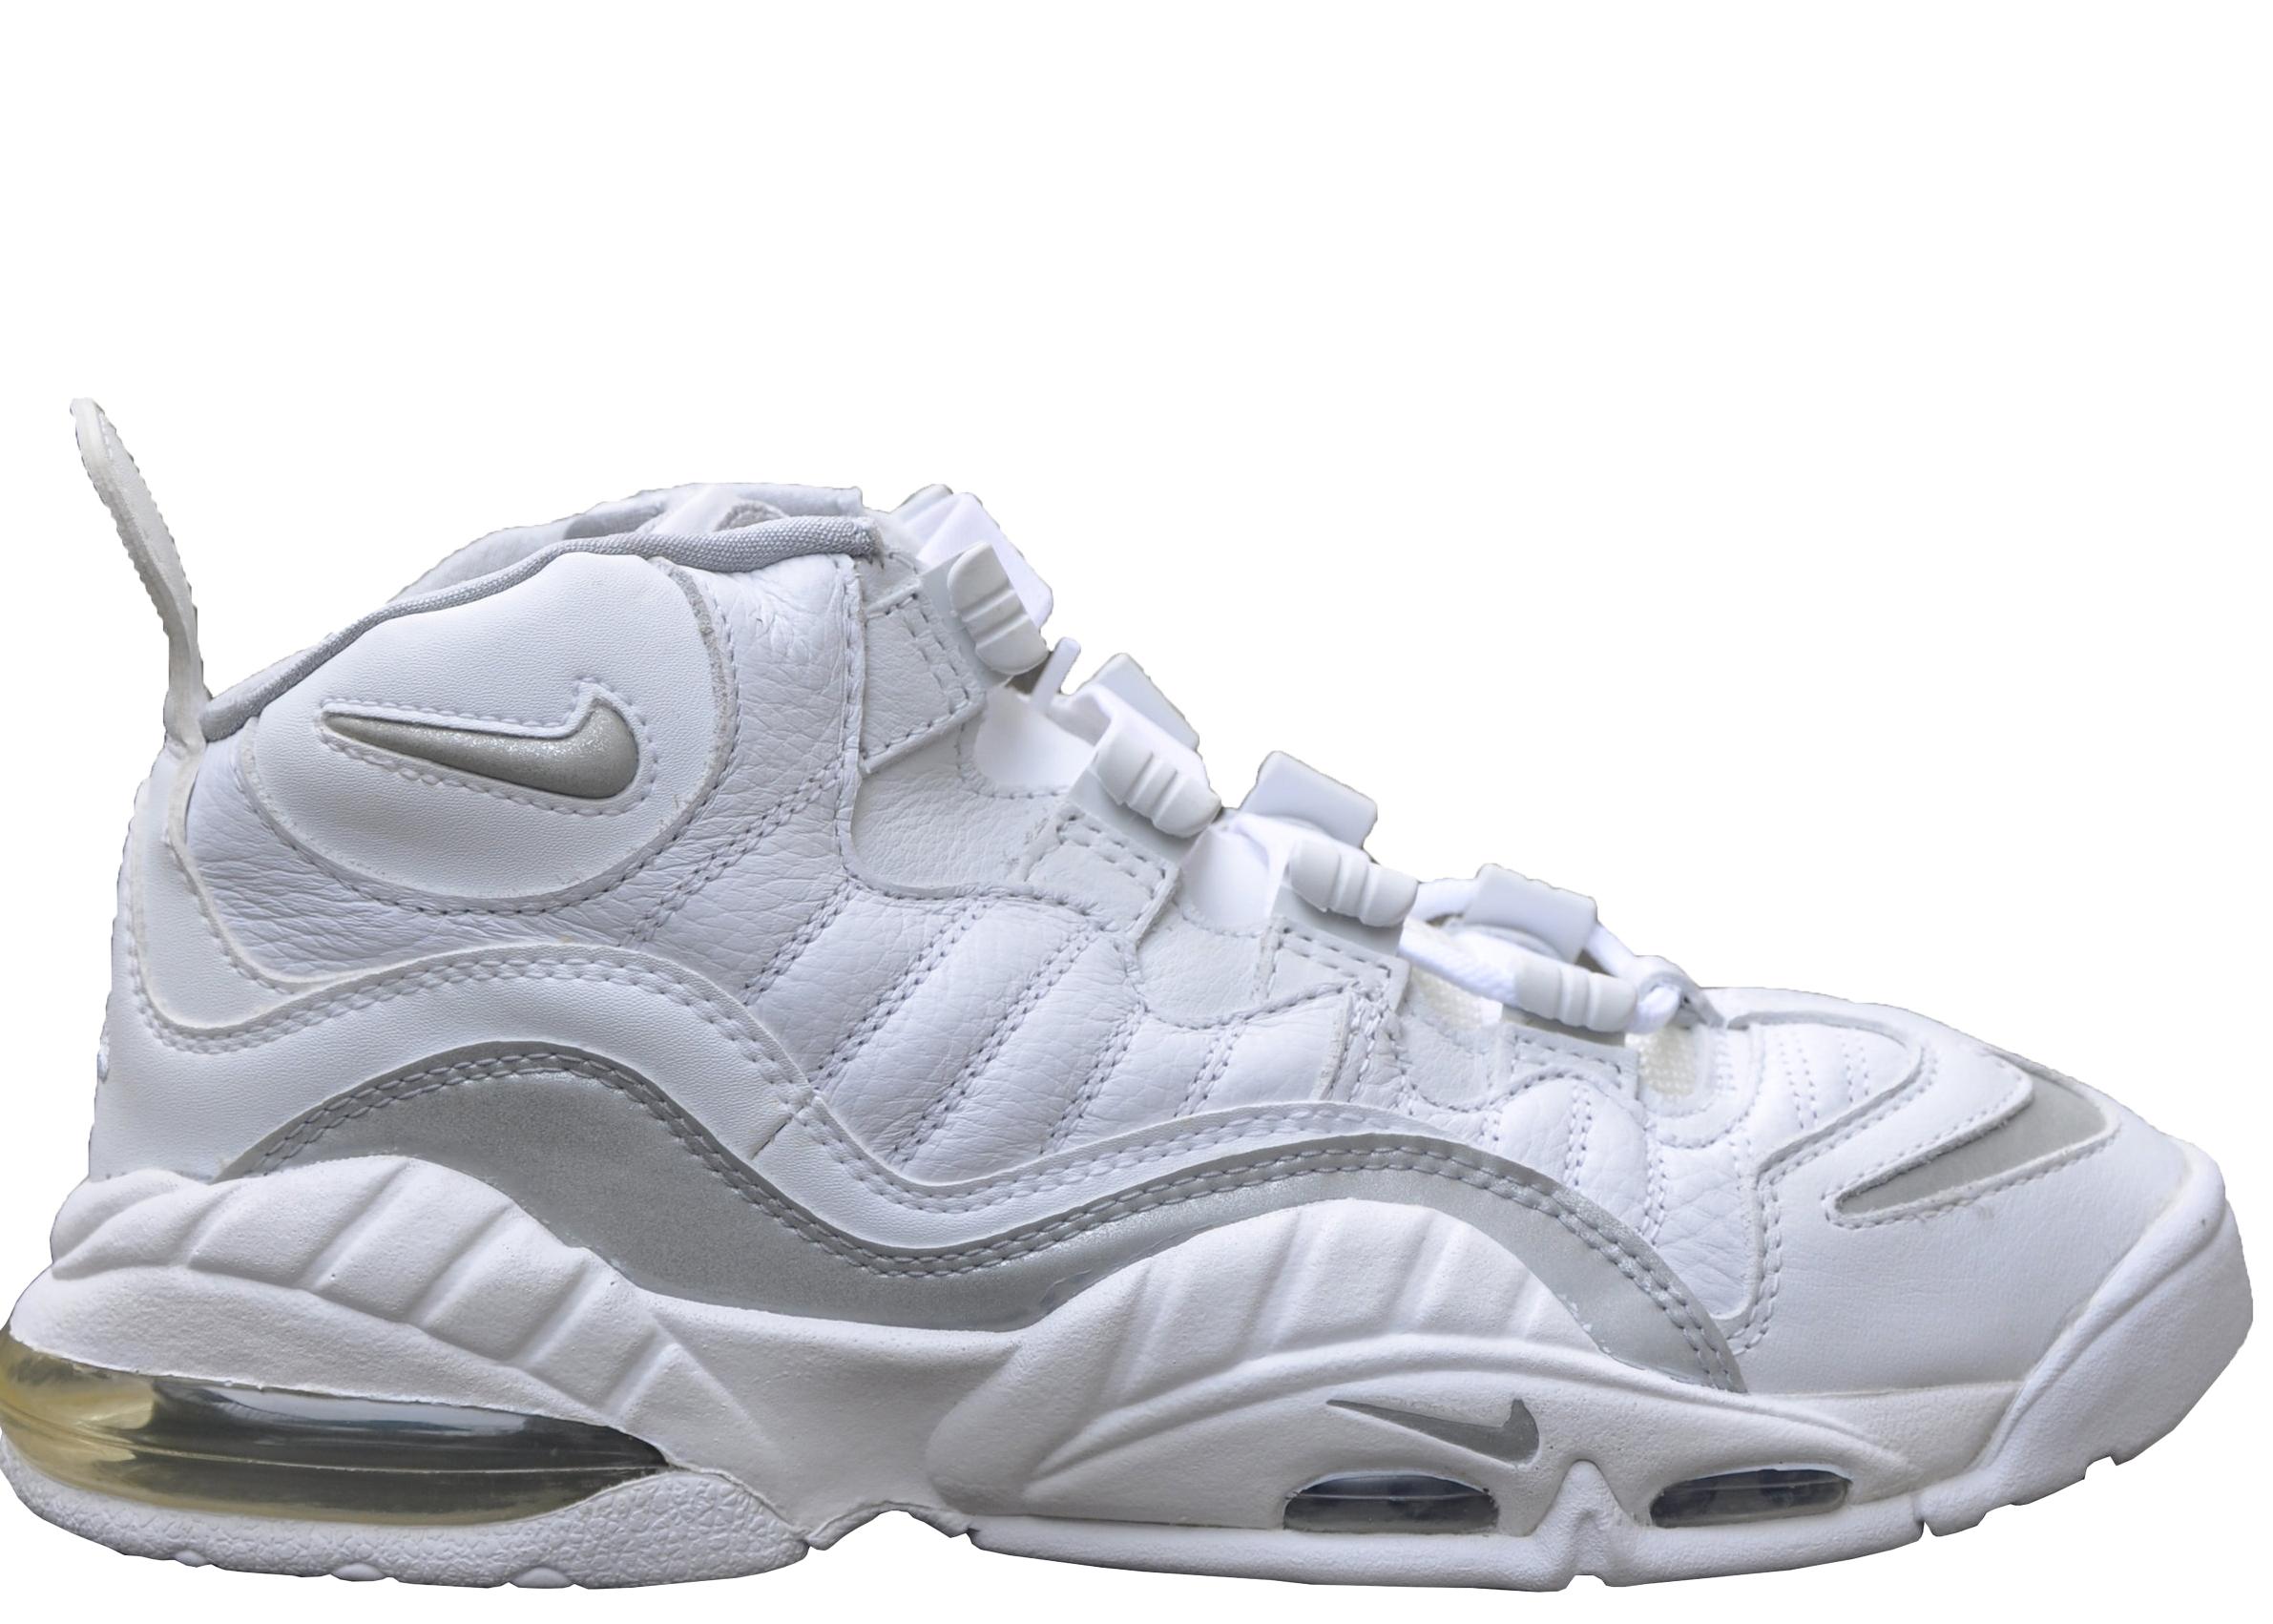 Nike Air Max Sensation White Webber